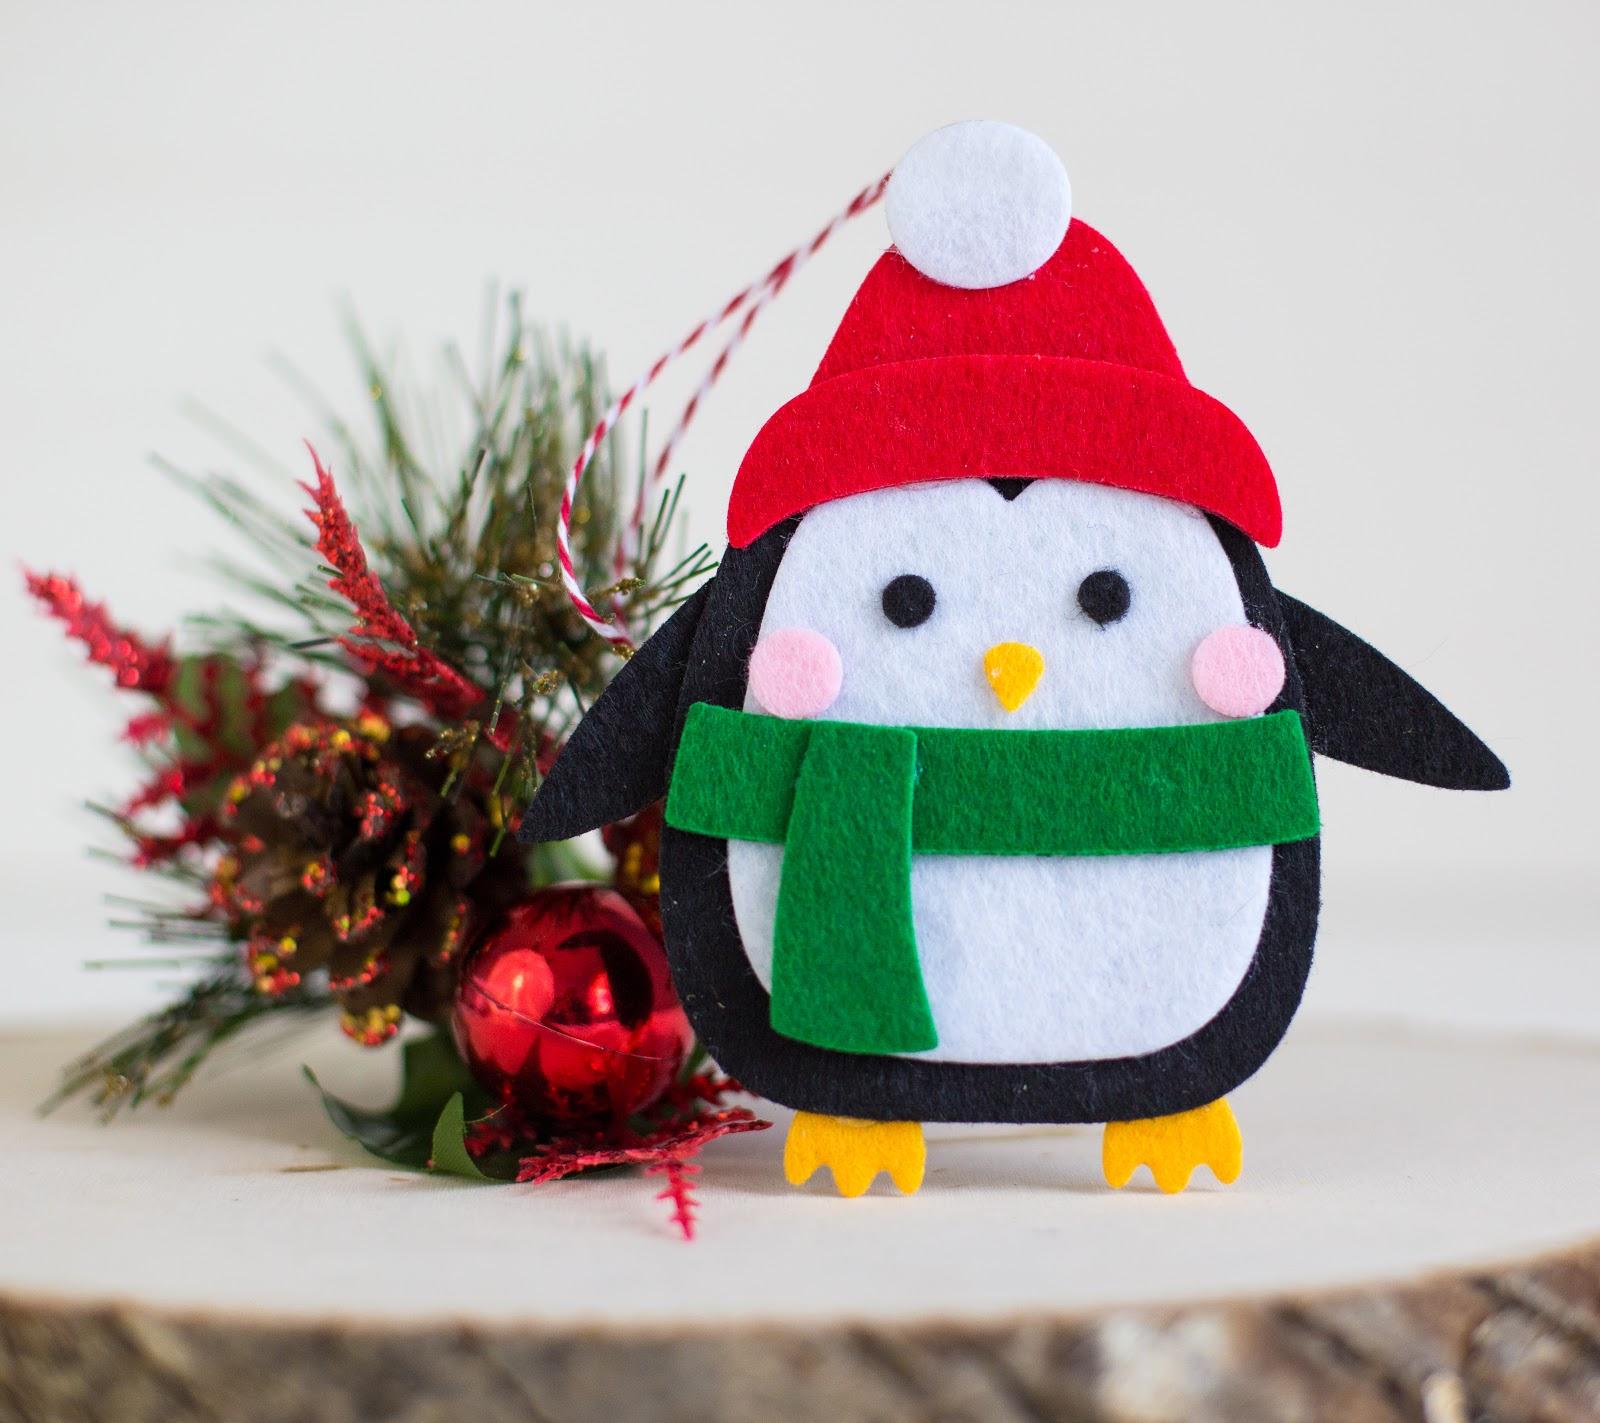 My Cluttered Corner: Quick & Easy No Sew Felt Ornaments